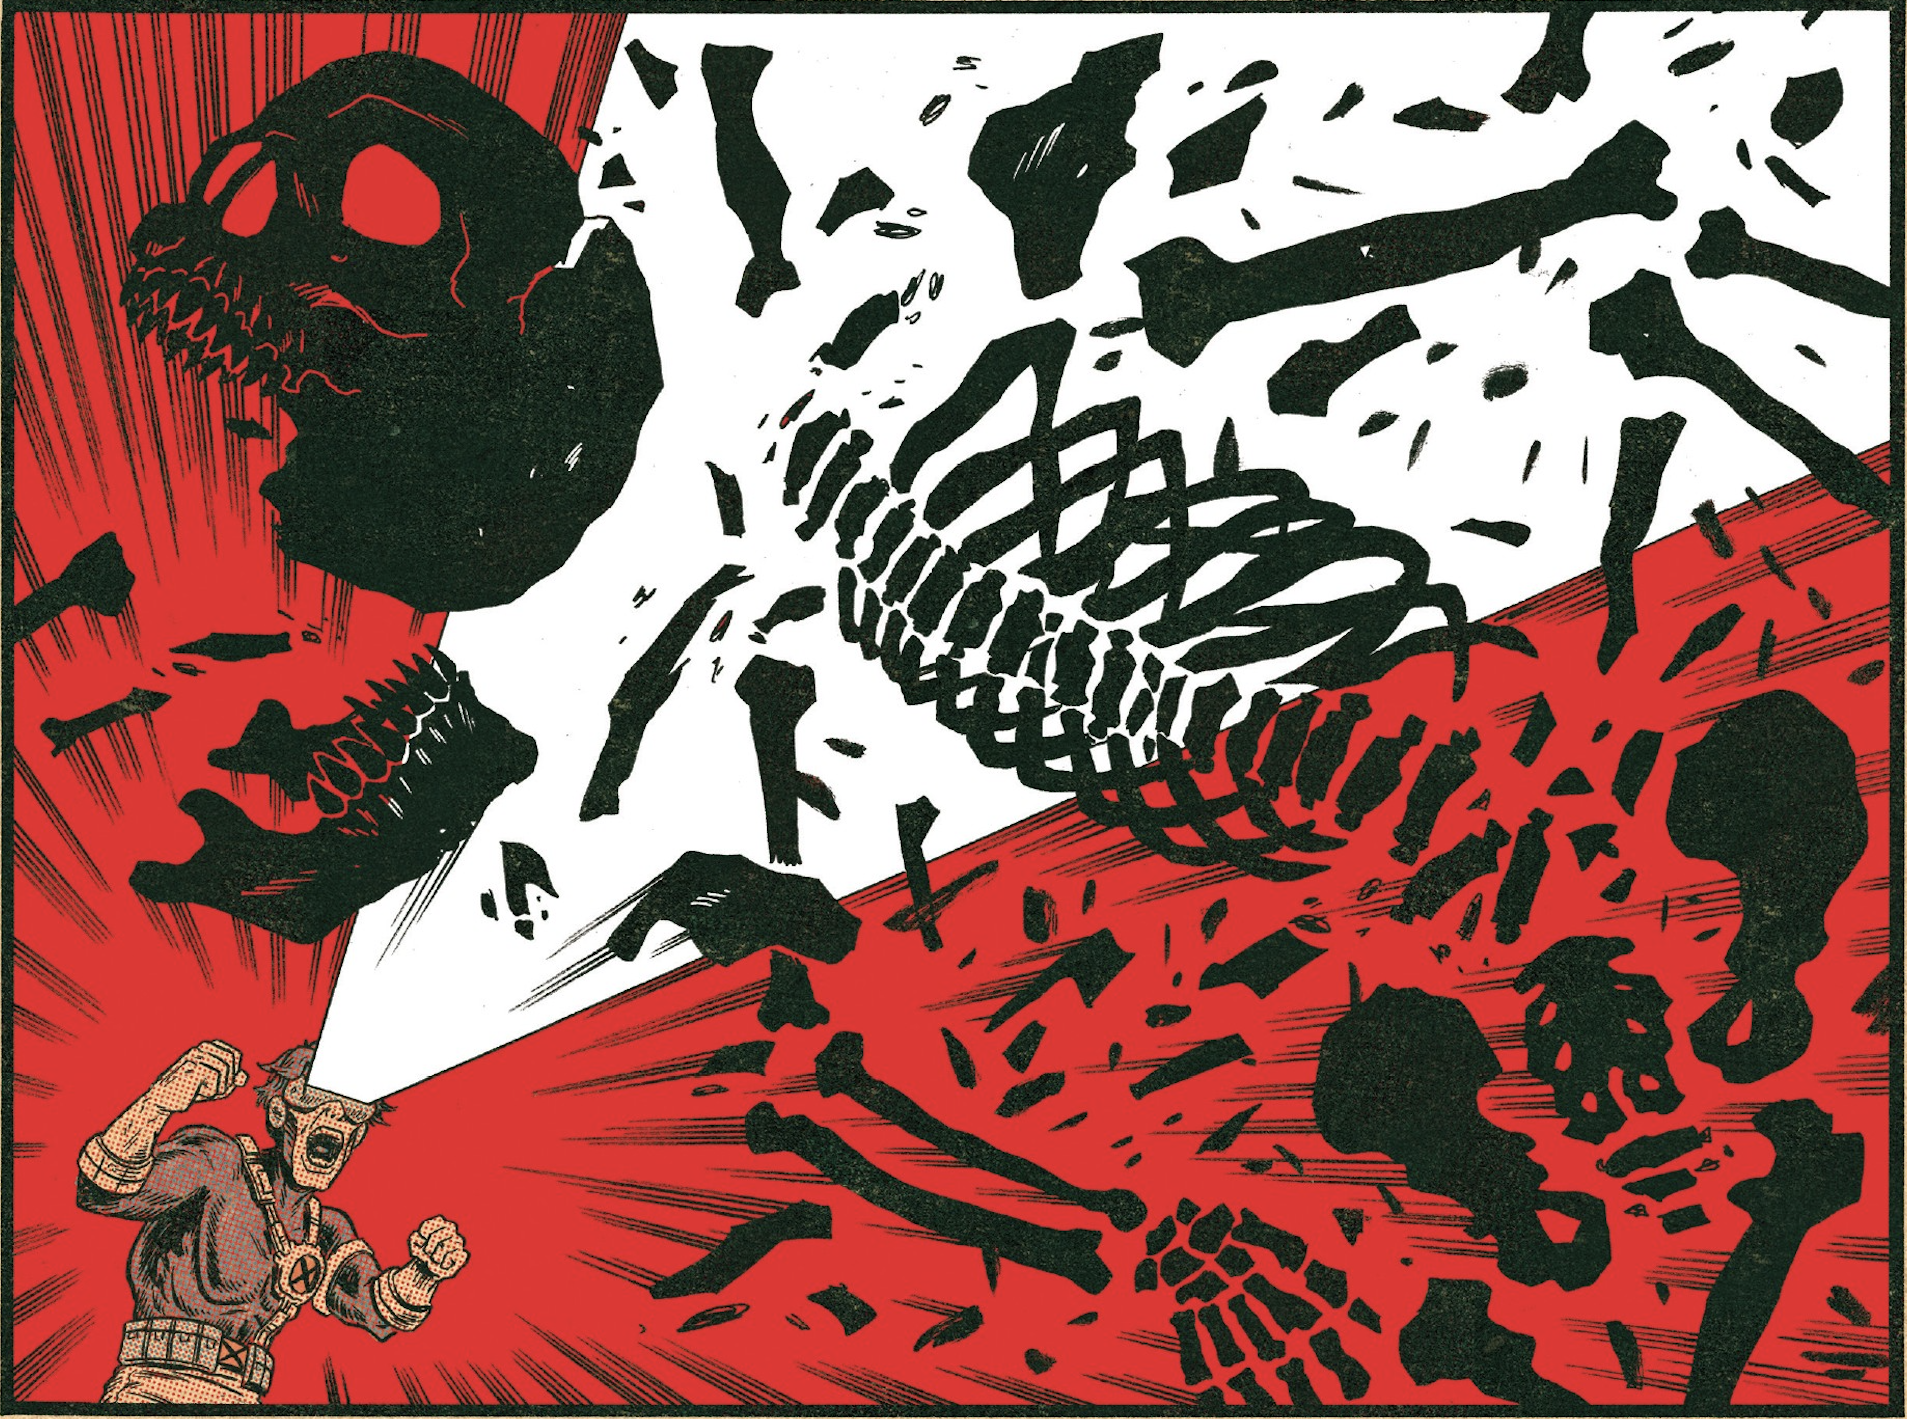 X Men Grand Design X Tinction 2019 1 Of 2 Comics By Comixology In 2020 Comics X Men Mr Sinister